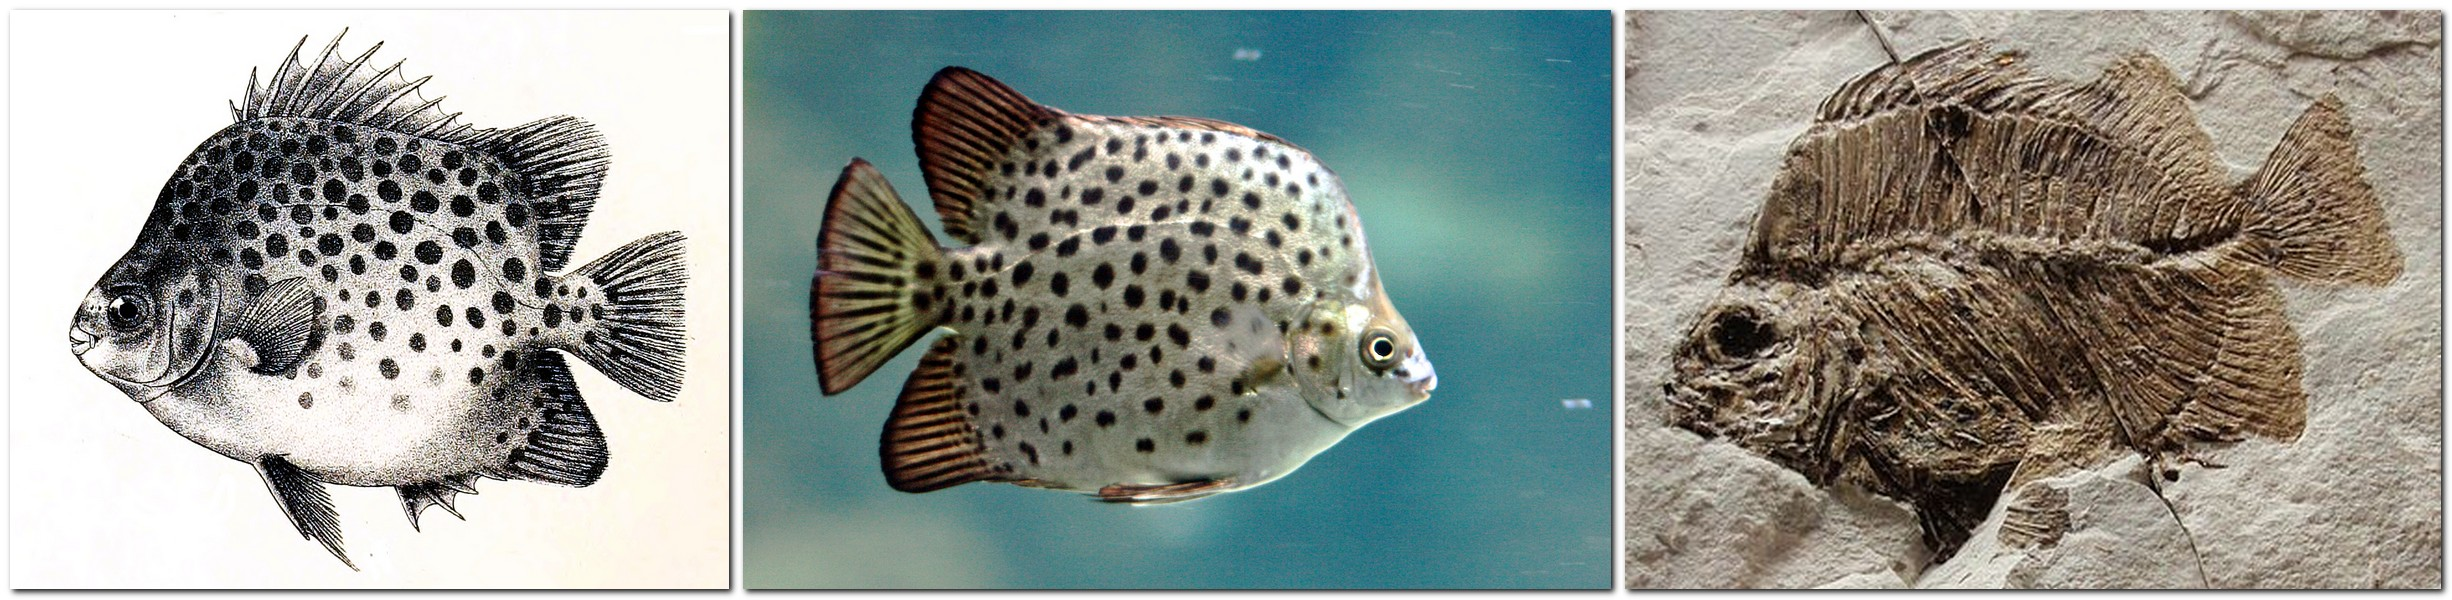 Afrikanischer Argusfisch - Scatophagus tetracanthus